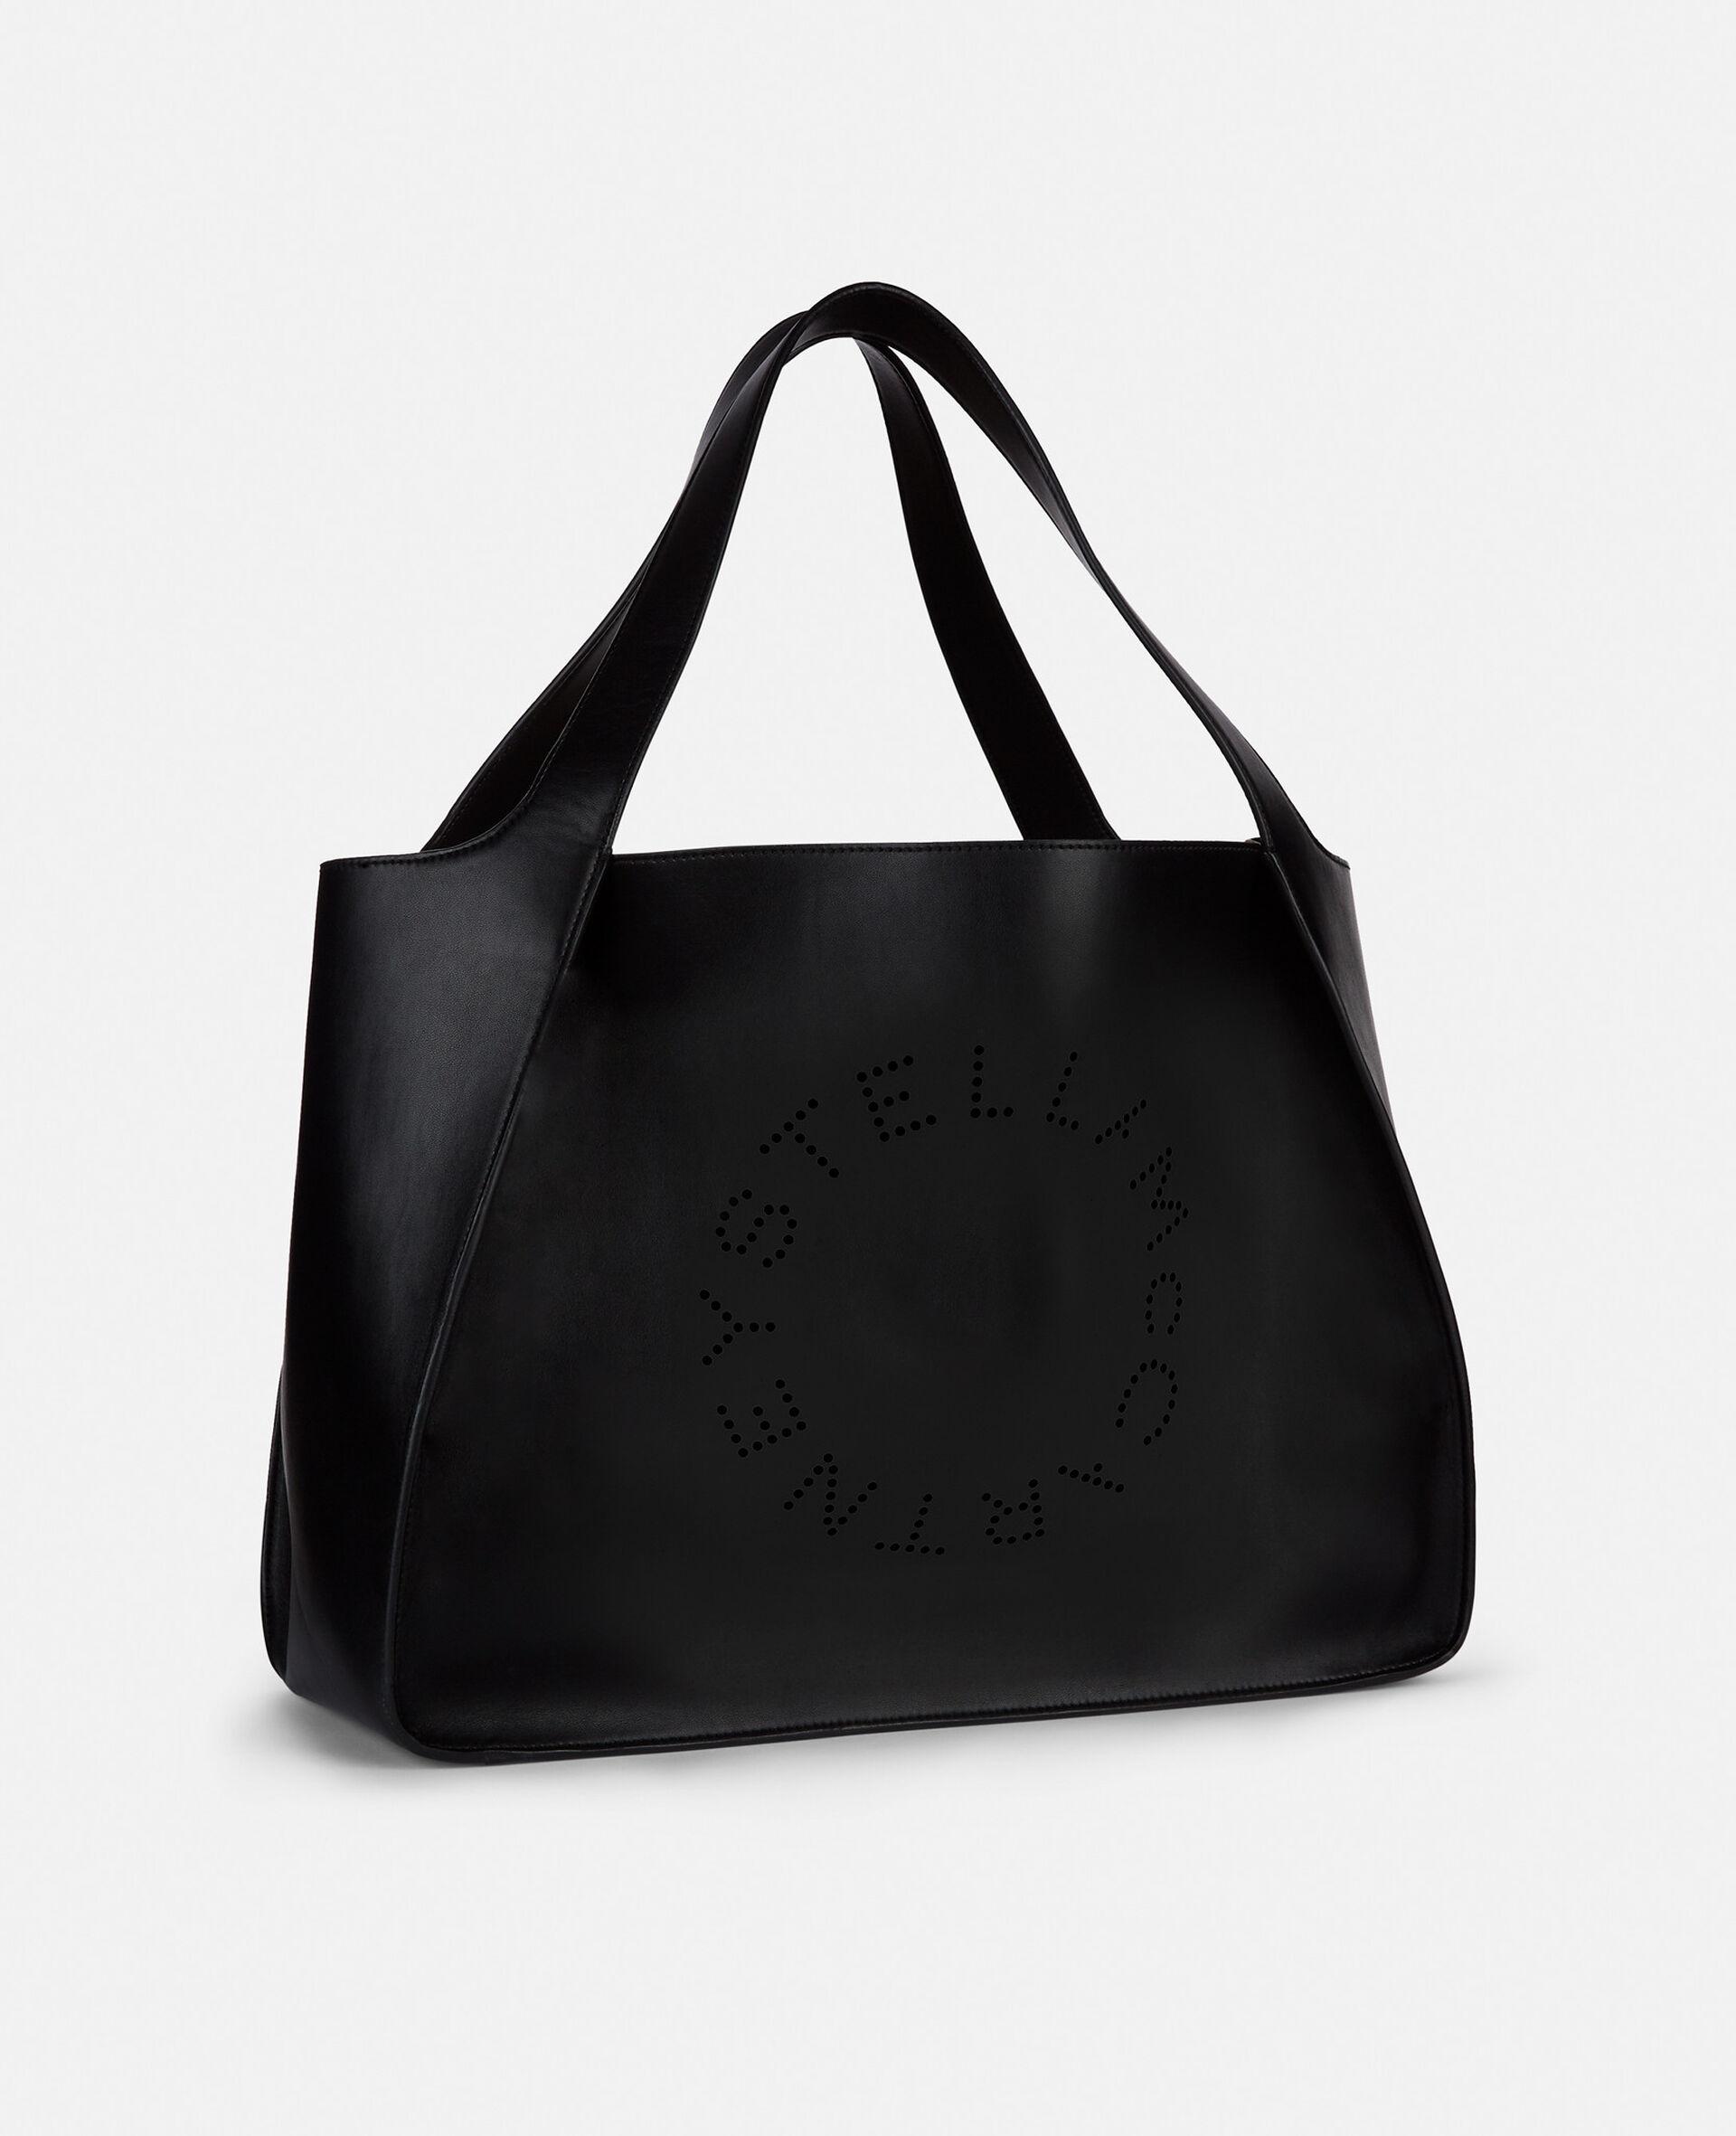 Stella Logo Tote Bag-Brown-large image number 1